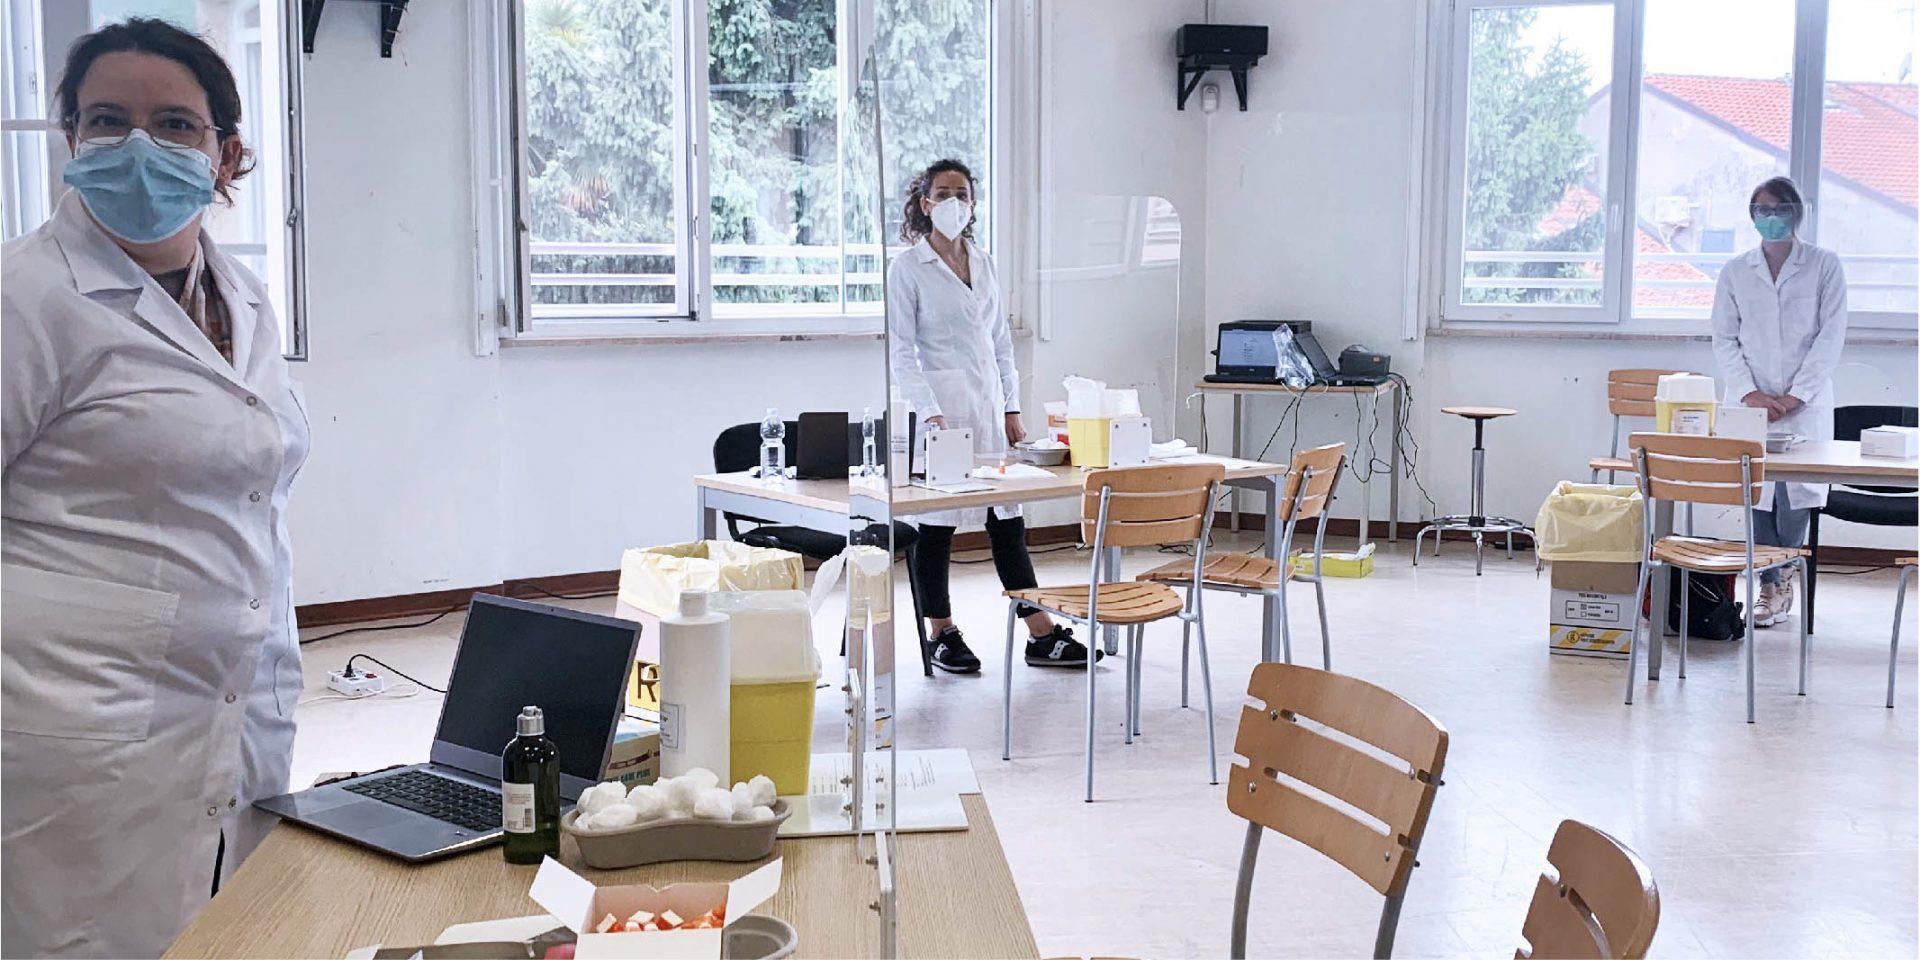 Studio epidemiologico - Carpiano